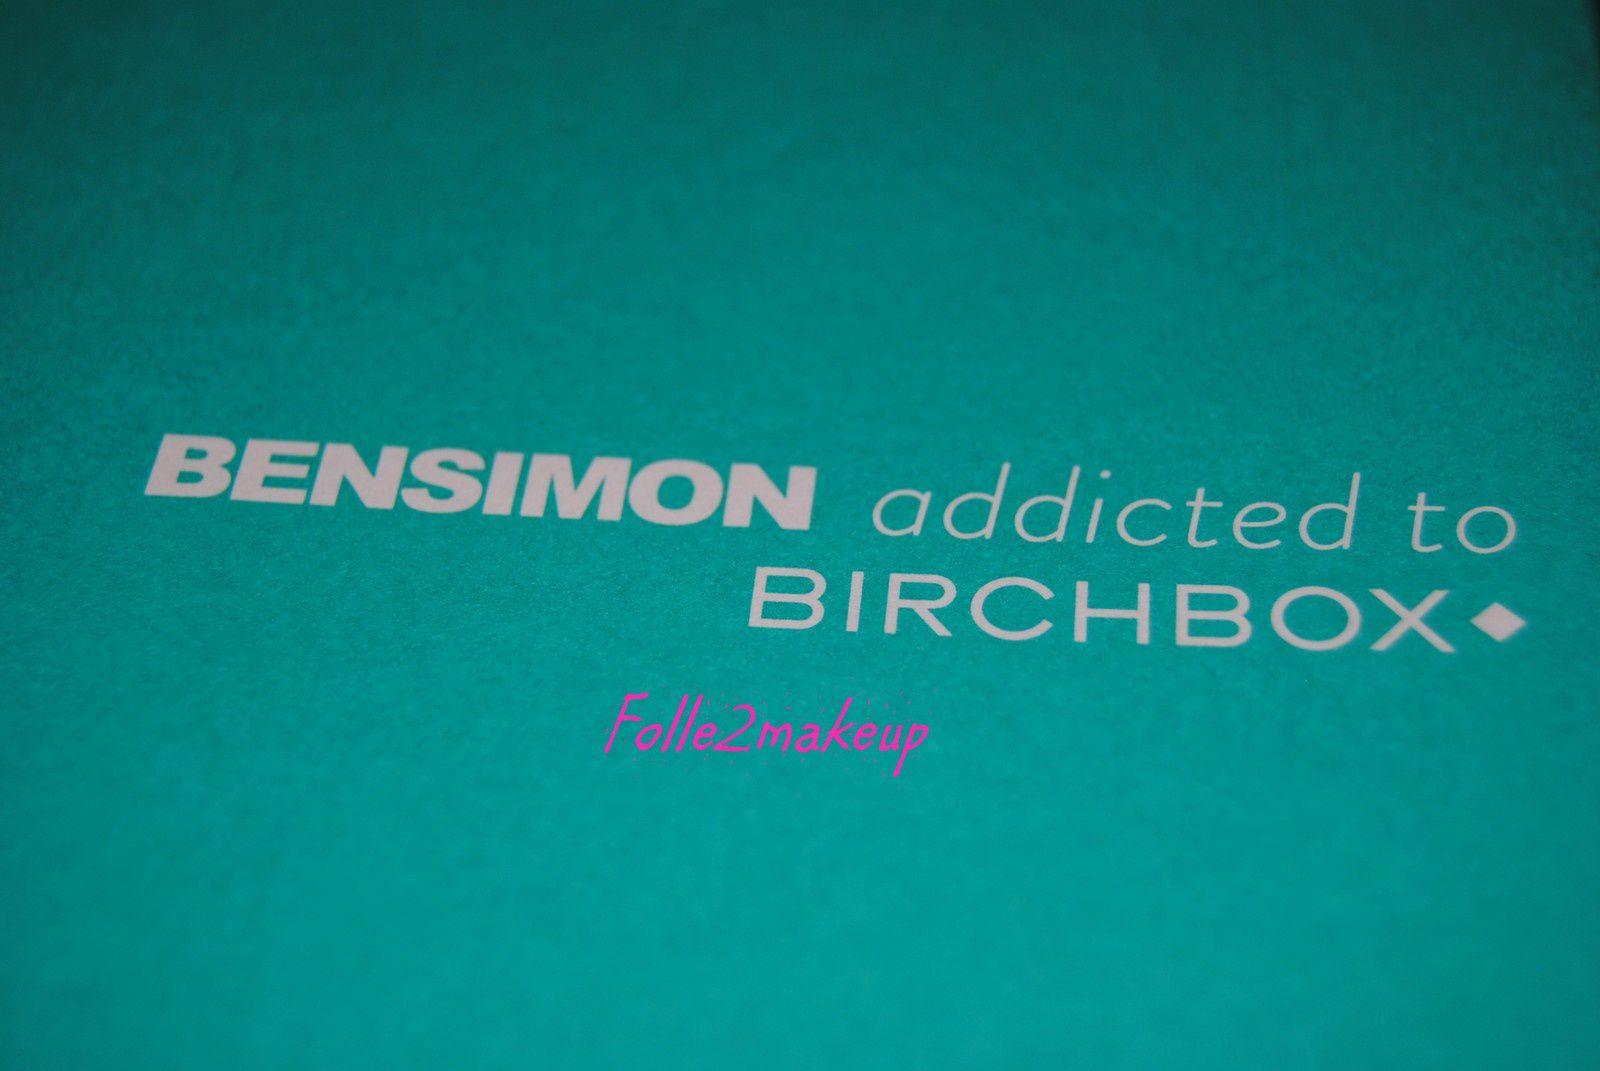 BENSIMON addicted to BIRCHBOX